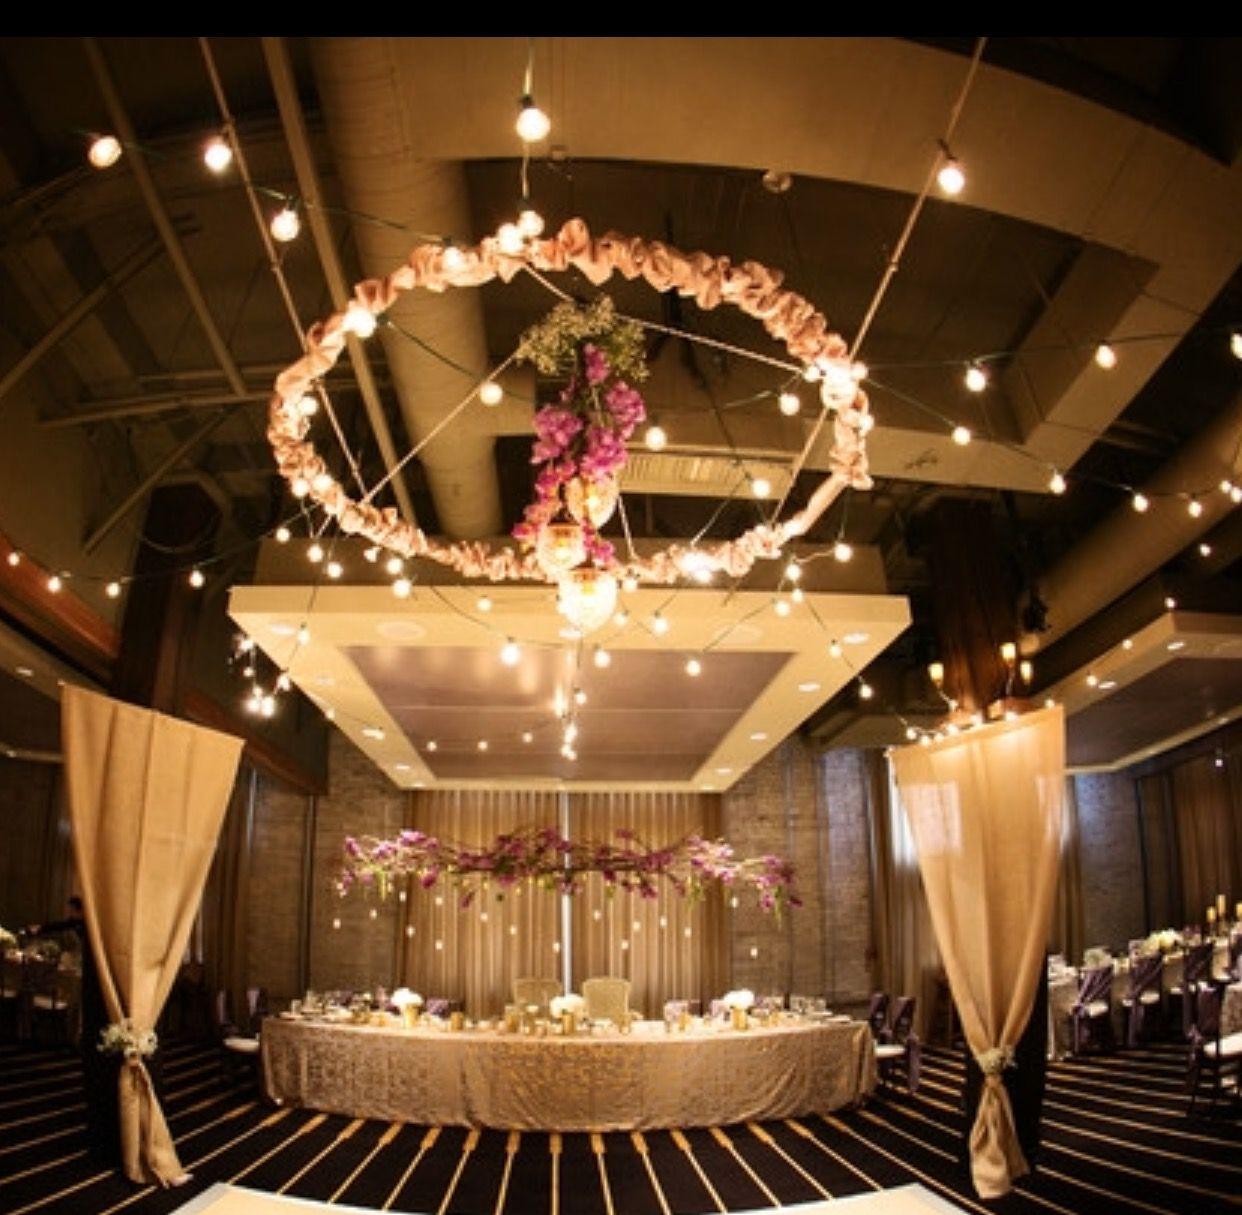 Cheap Wedding Reception Venue Ideas: Pin By Kristina Nordstrom On W E D D I N G